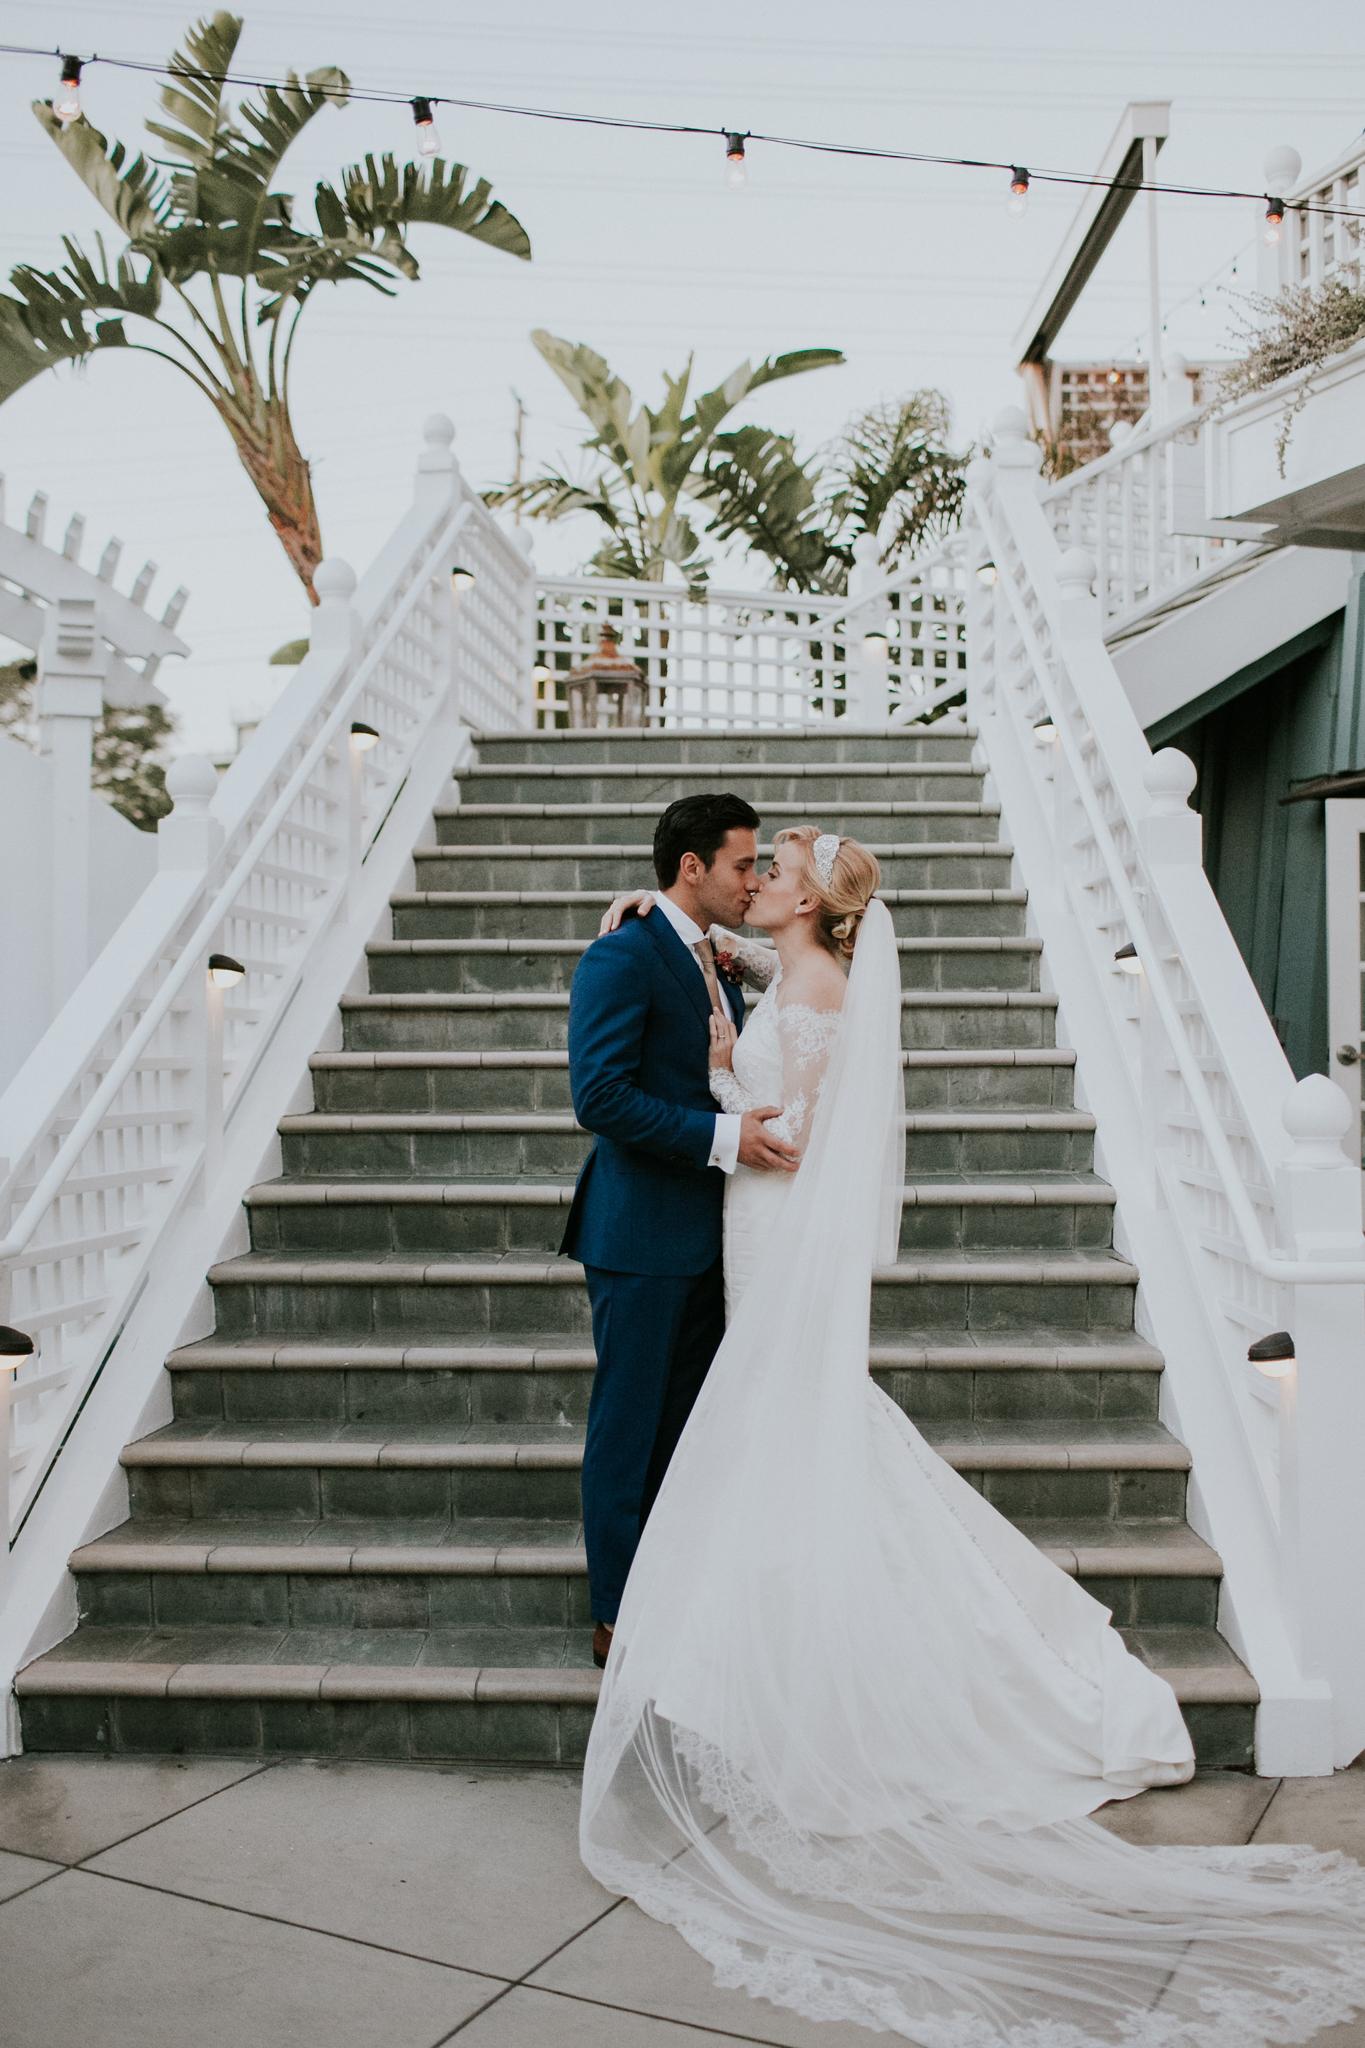 20151230_hussem_wedding_0655_web.jpg